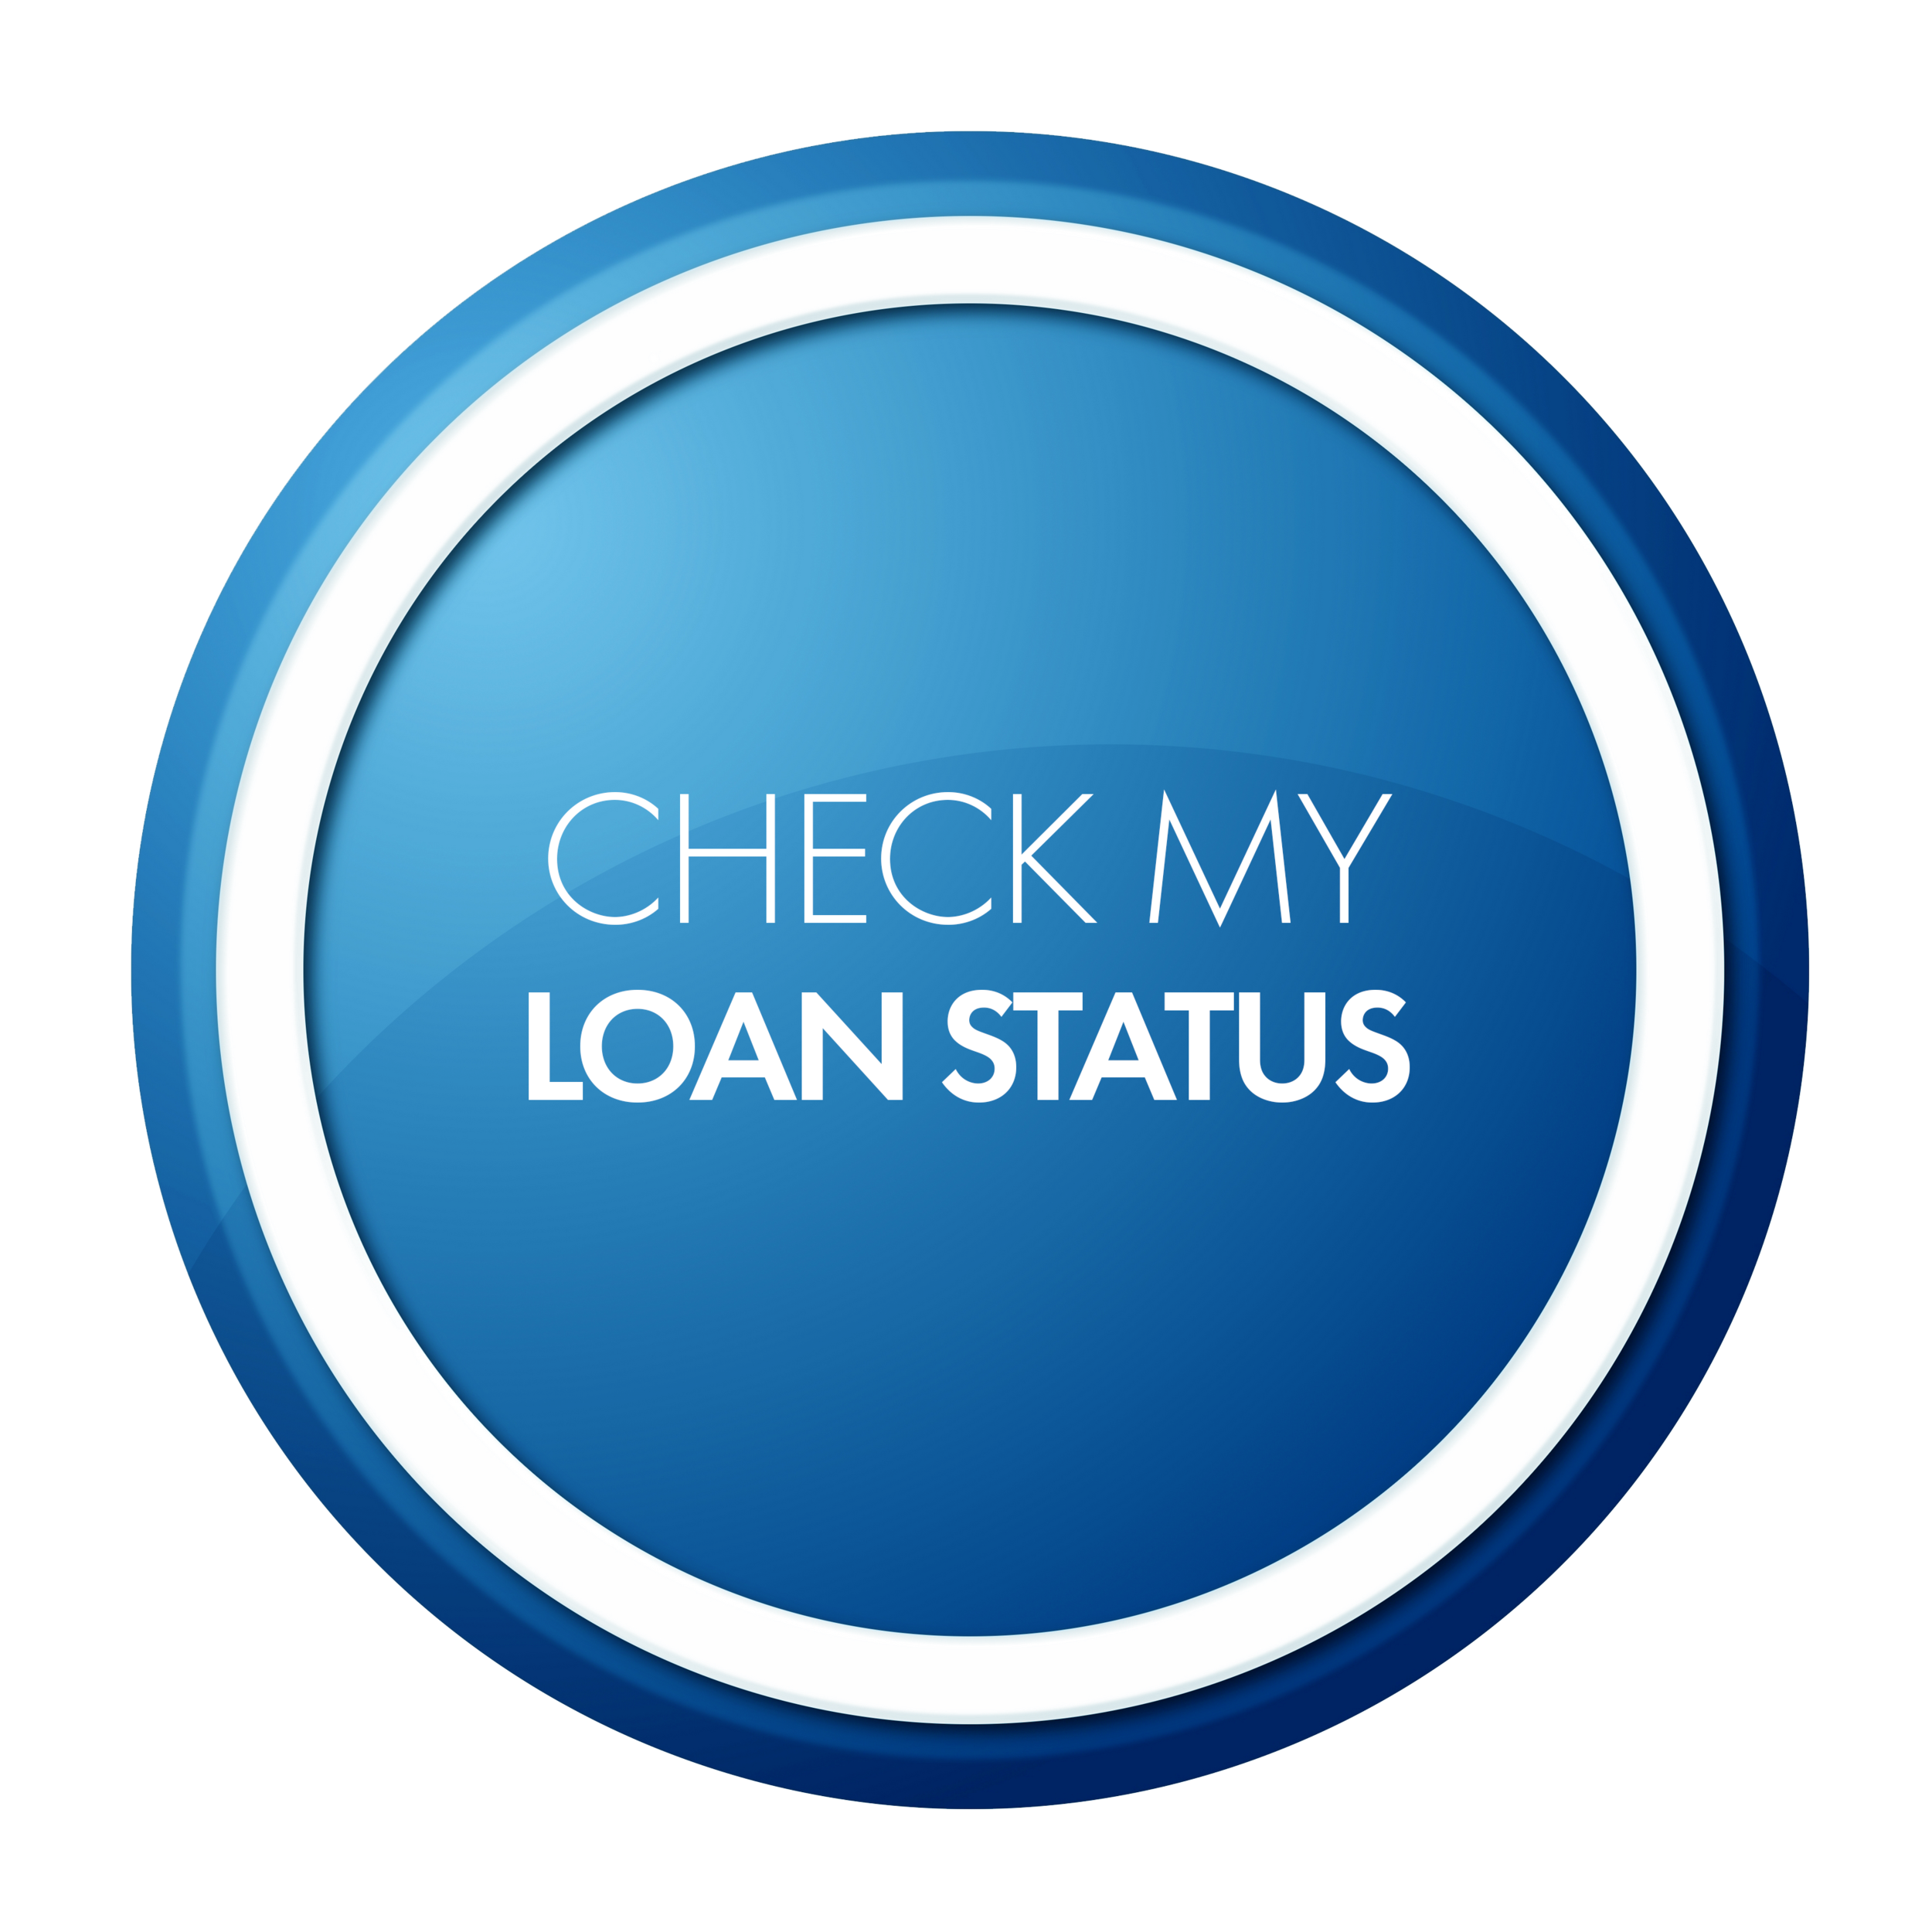 Check My Loan Status